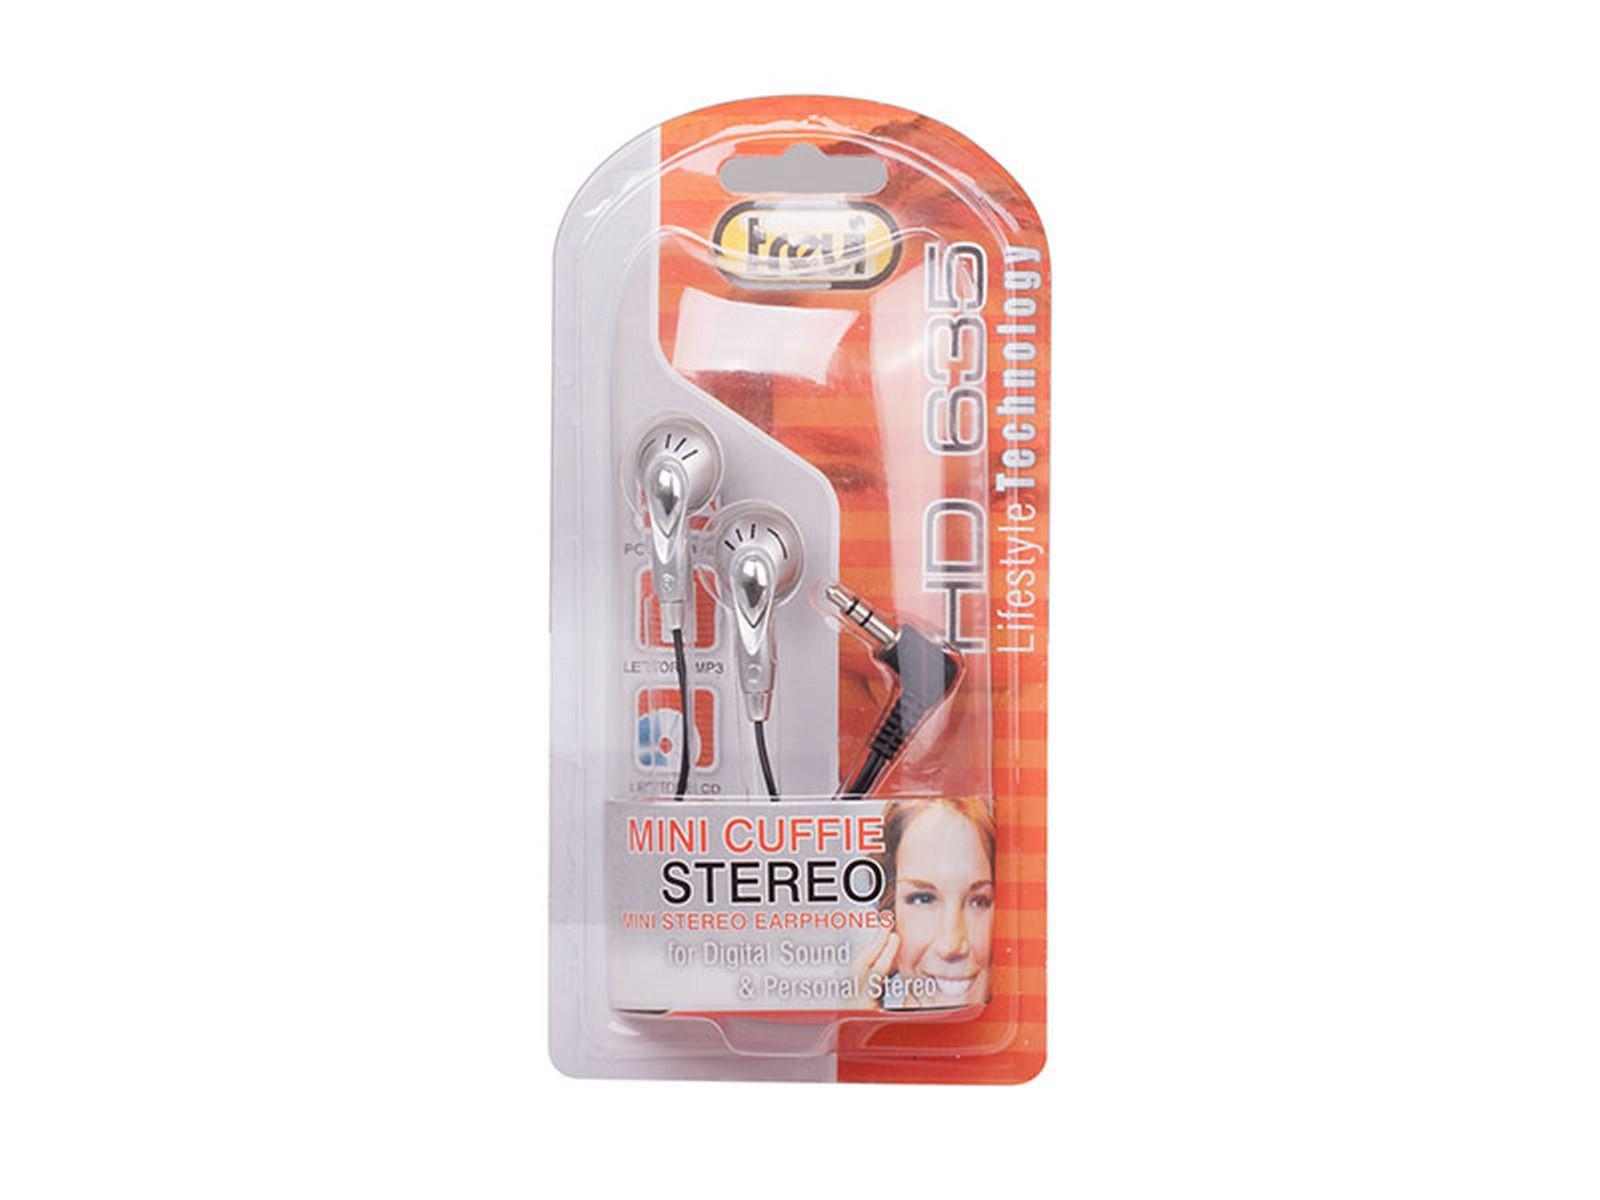 Cuffie Auricolari Stereo Trevi HD 635 Mini hifi Auricolare Sport Mp3 Per  nokia a69b3afe26d6